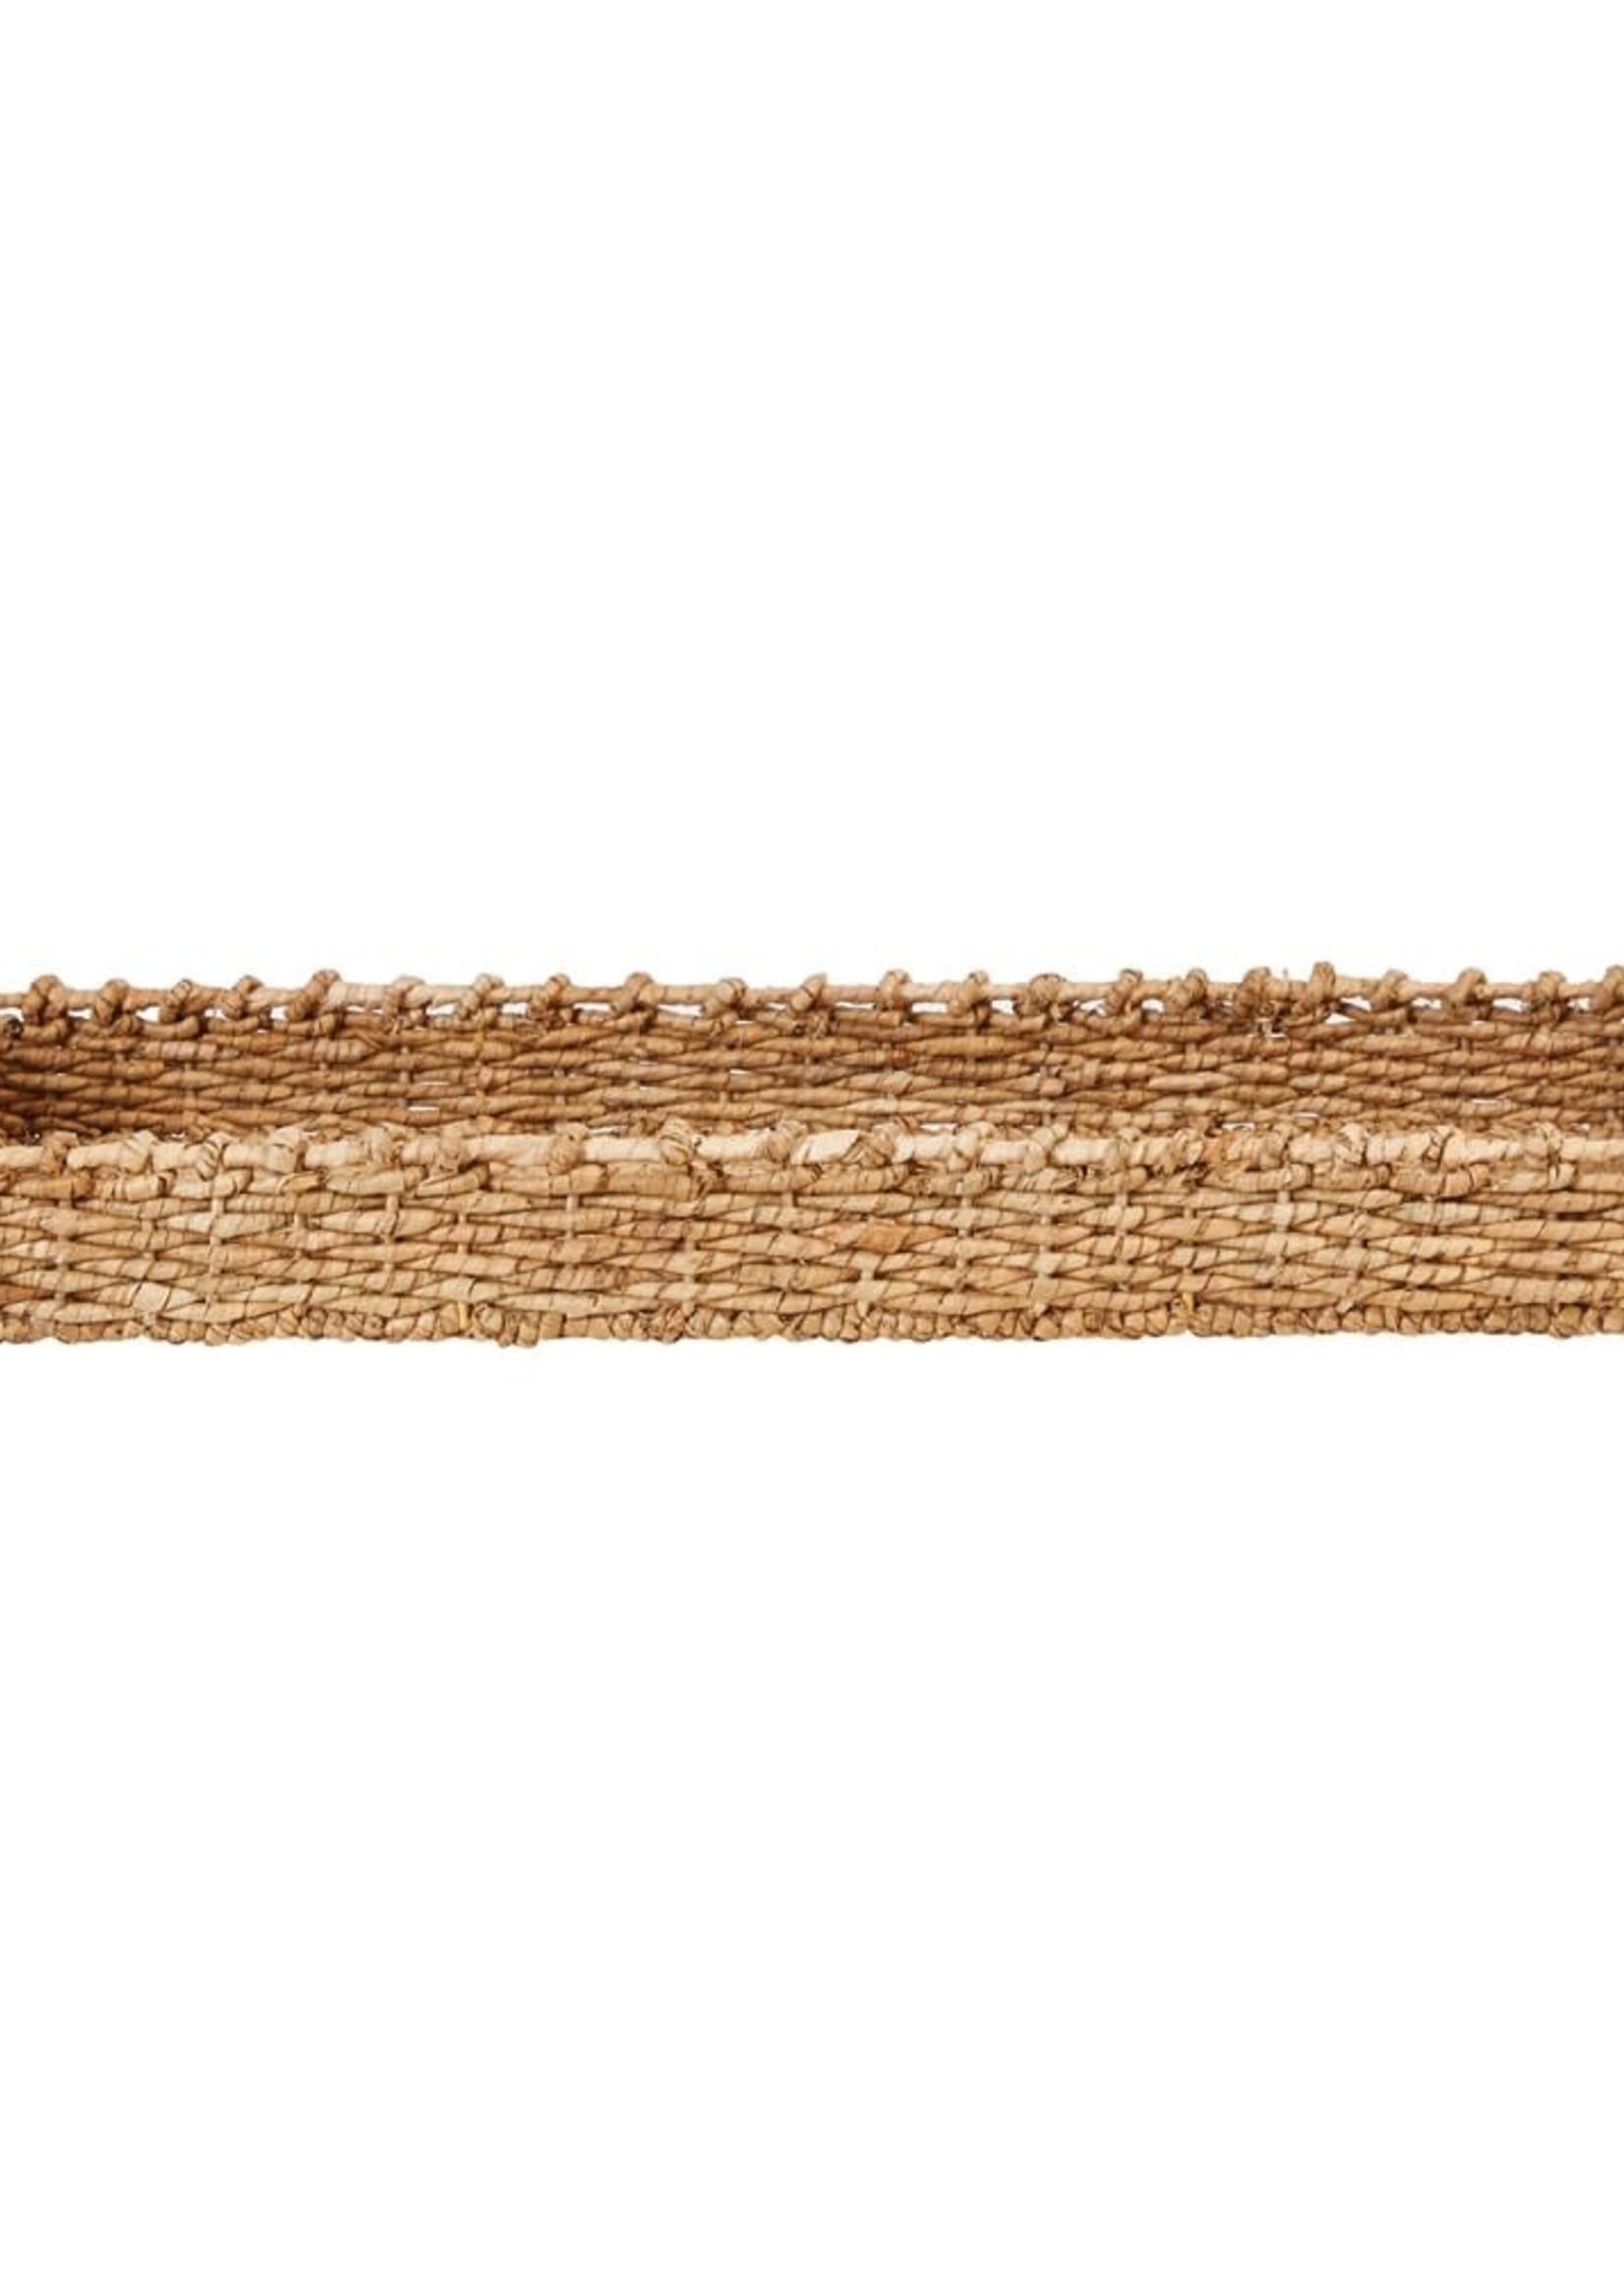 "30-1/2""L x 13""W x 6""H Decorative Hand-Woven Seagrass Tray w/ Handles"